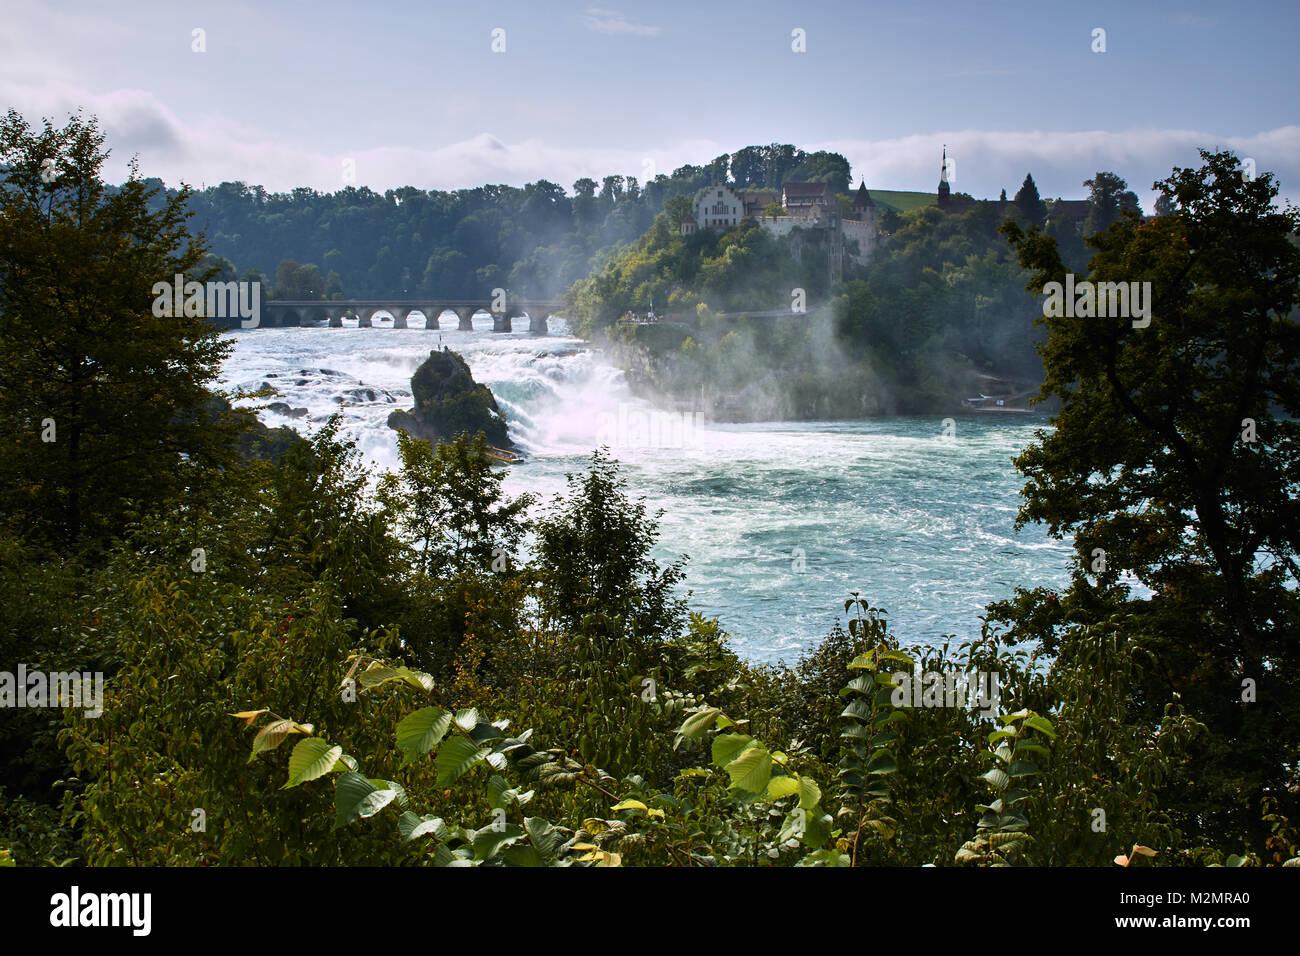 Rheinfall in summer, Switzerland - Stock Image